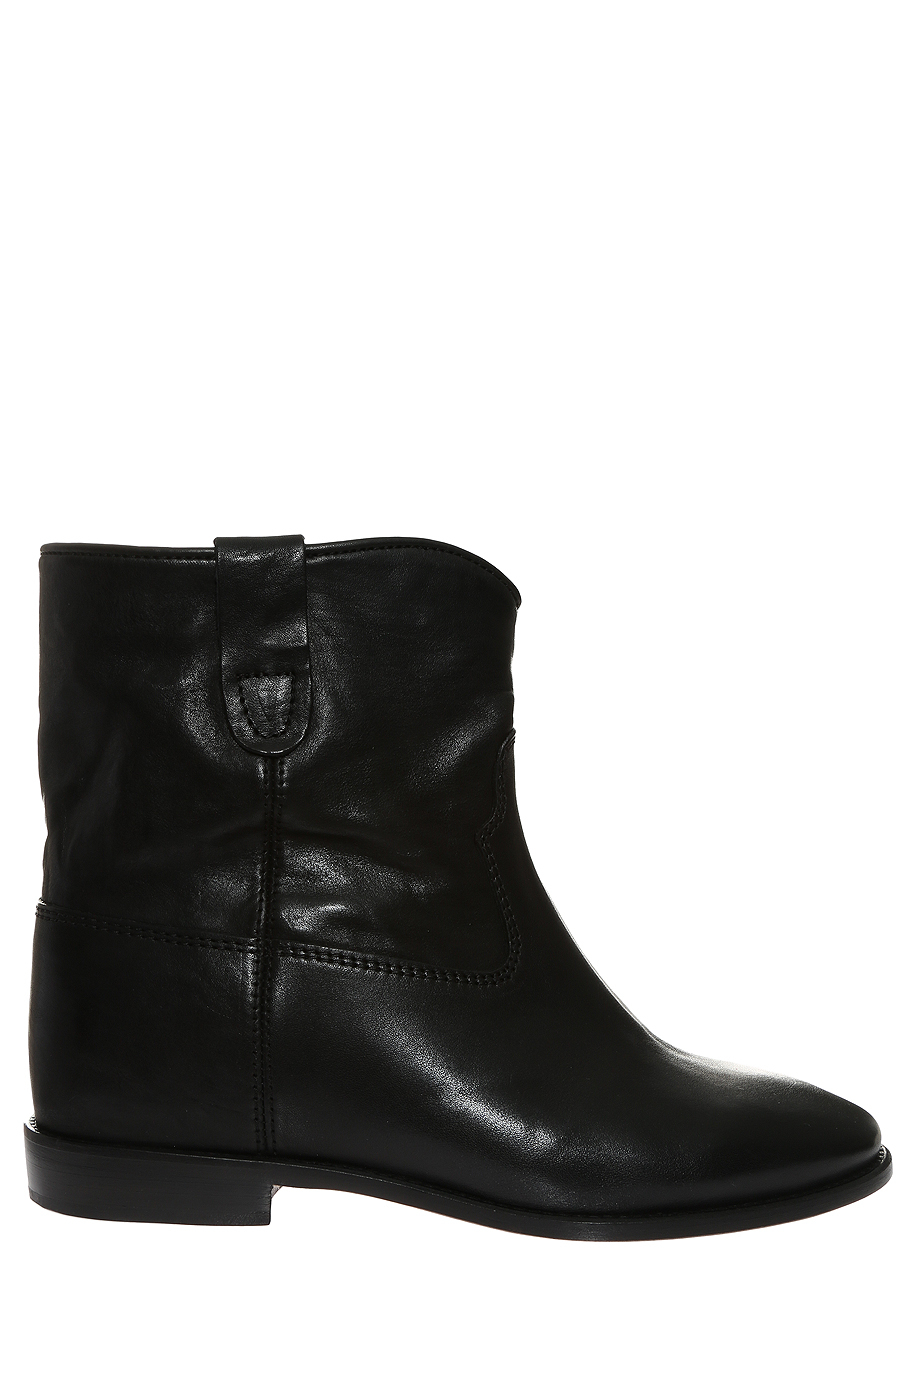 toile isabel marant cluster ankle boots in black lyst. Black Bedroom Furniture Sets. Home Design Ideas